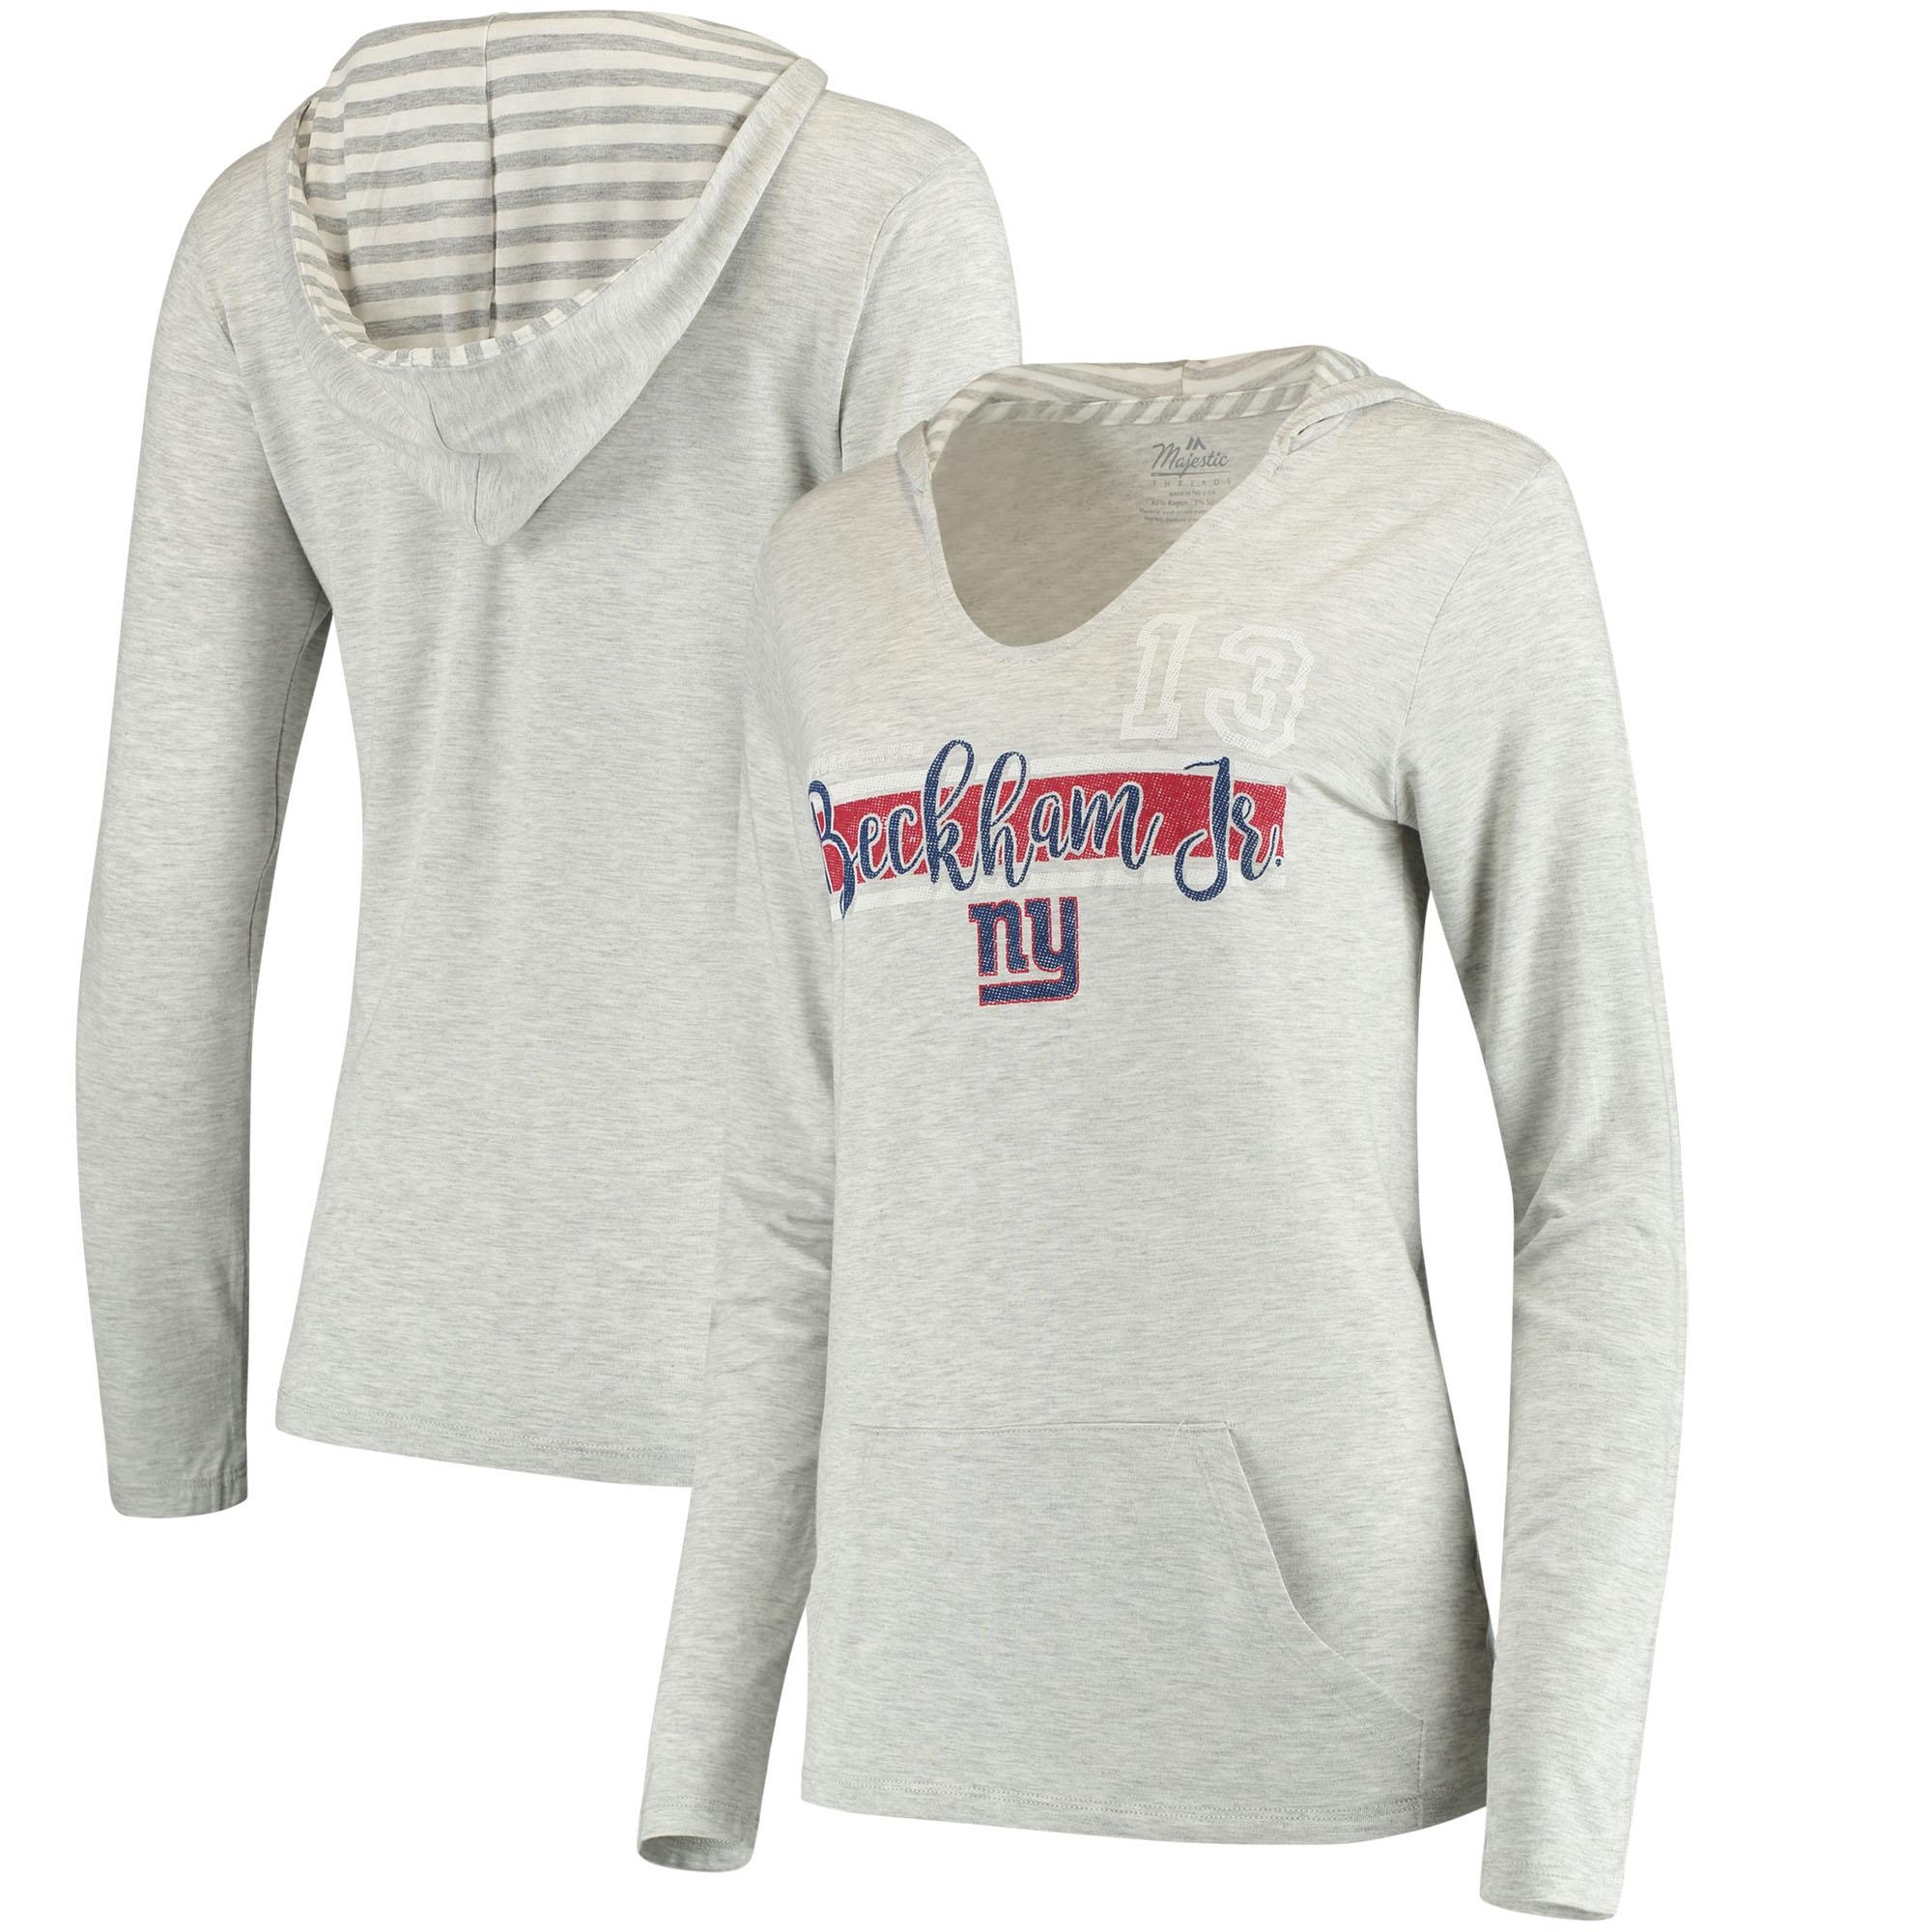 Odell Beckham Jr New York Giants Women's Pocket Name & Number Hoodie T-Shirt - Gray